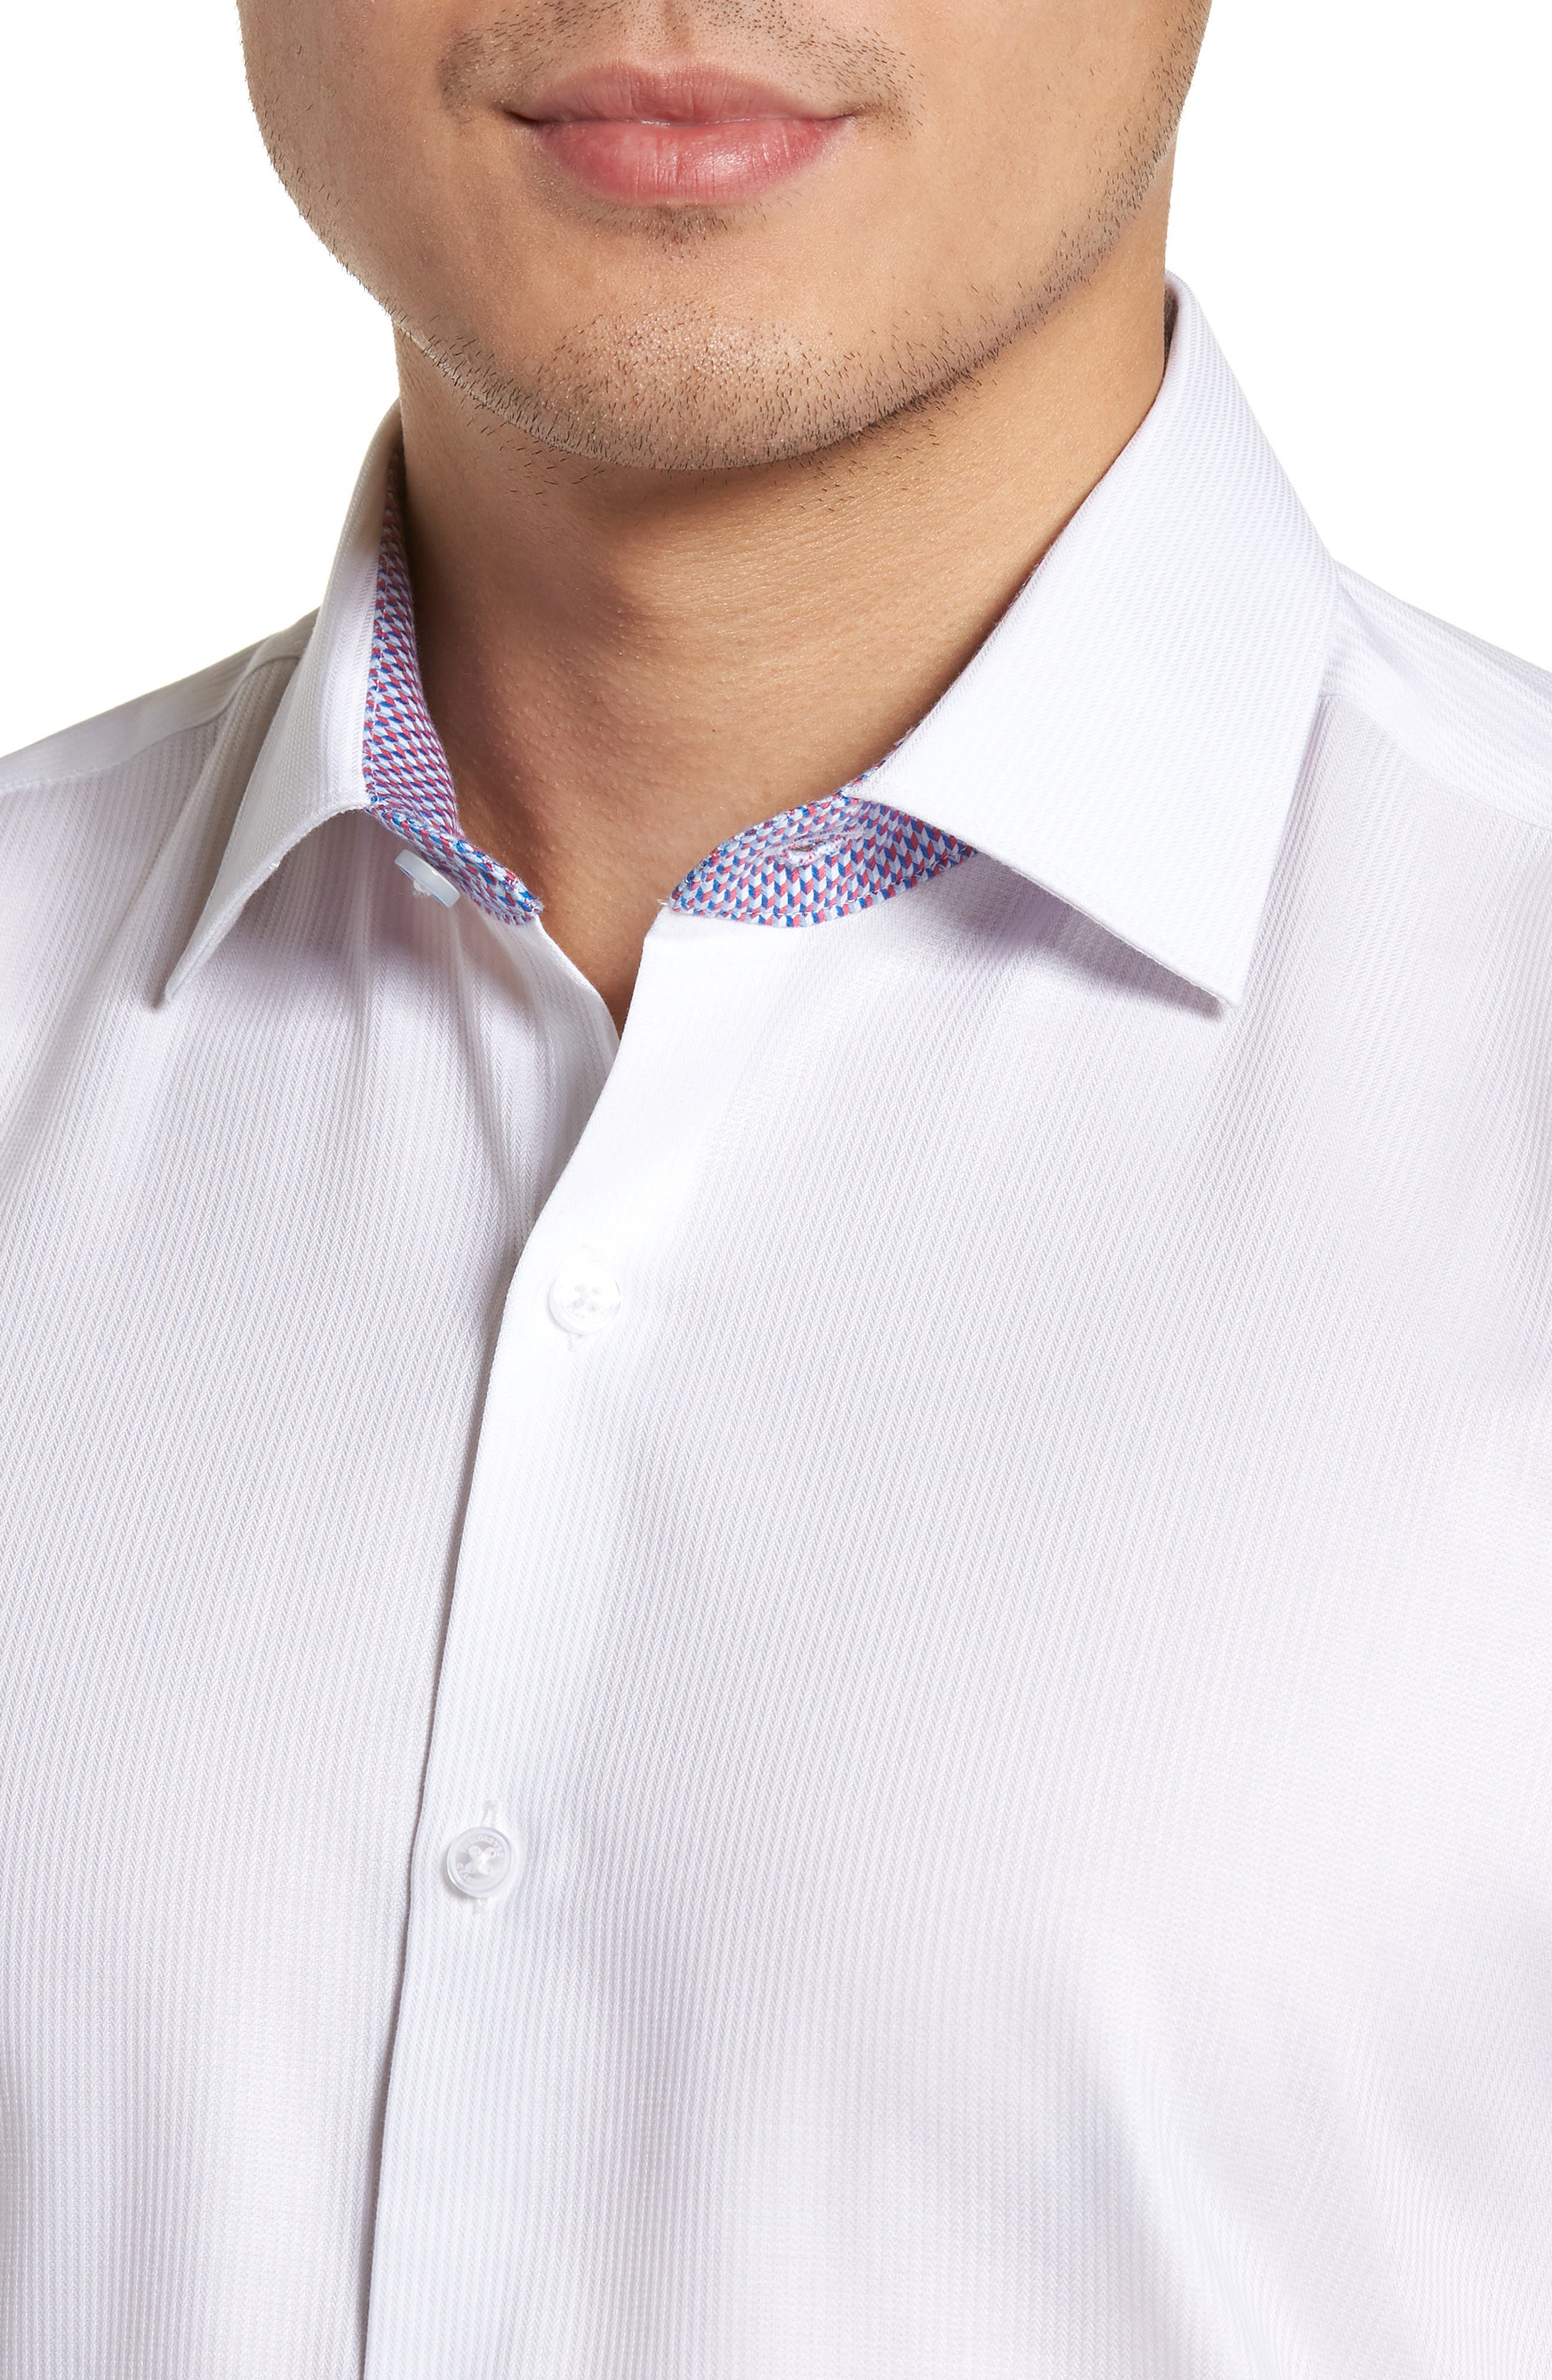 Becker Trim Fit Stripe Dress Shirt,                             Alternate thumbnail 2, color,                             White